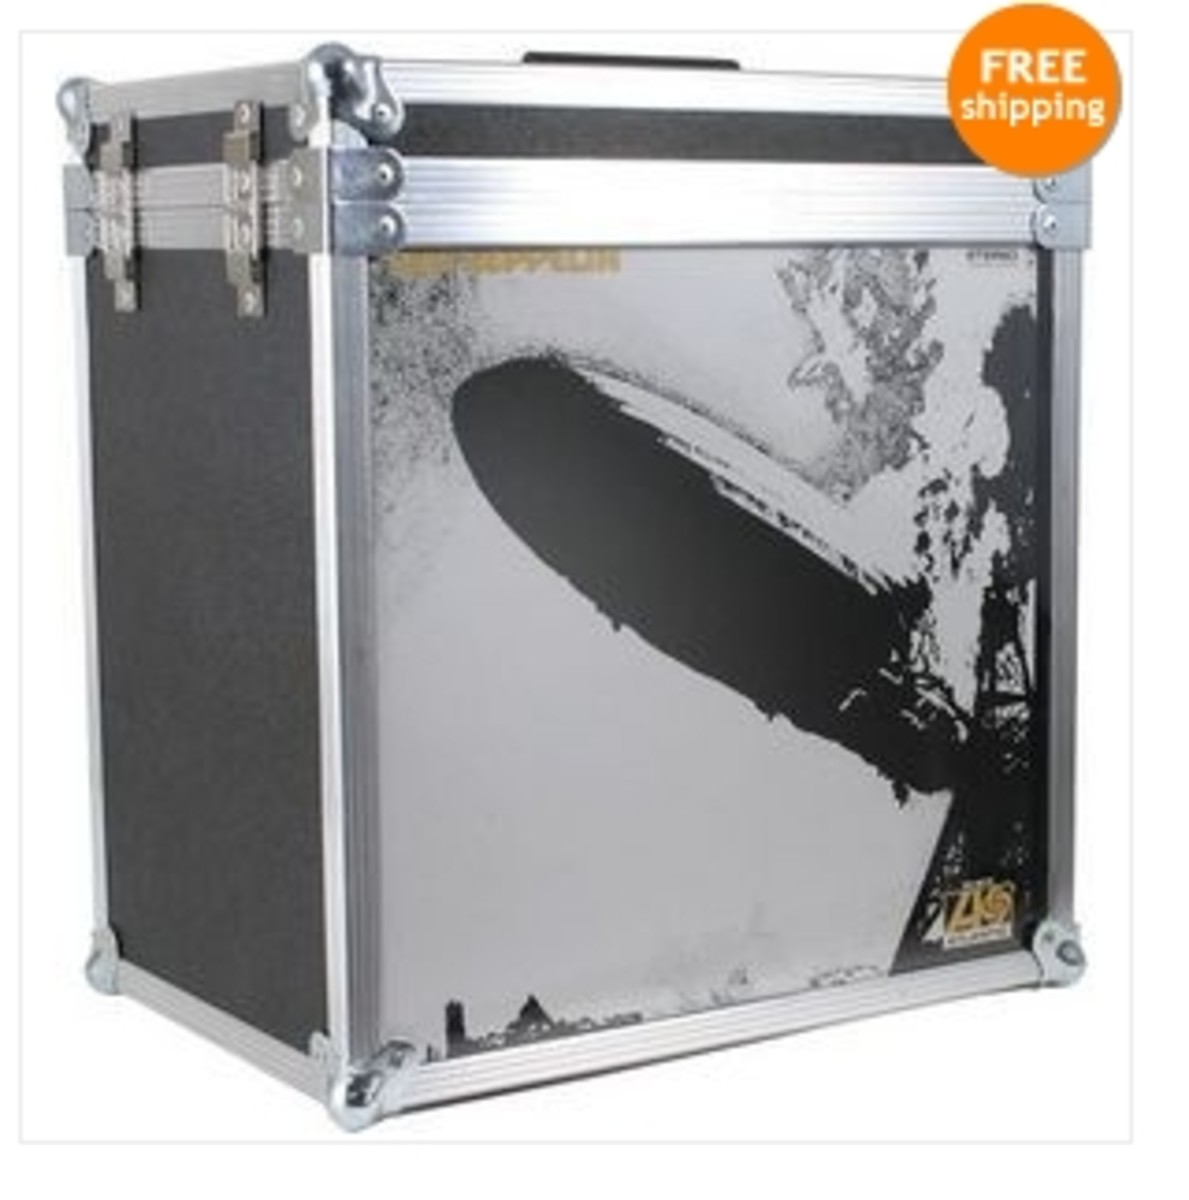 Led-Zeppelin-road-case-boxed-set